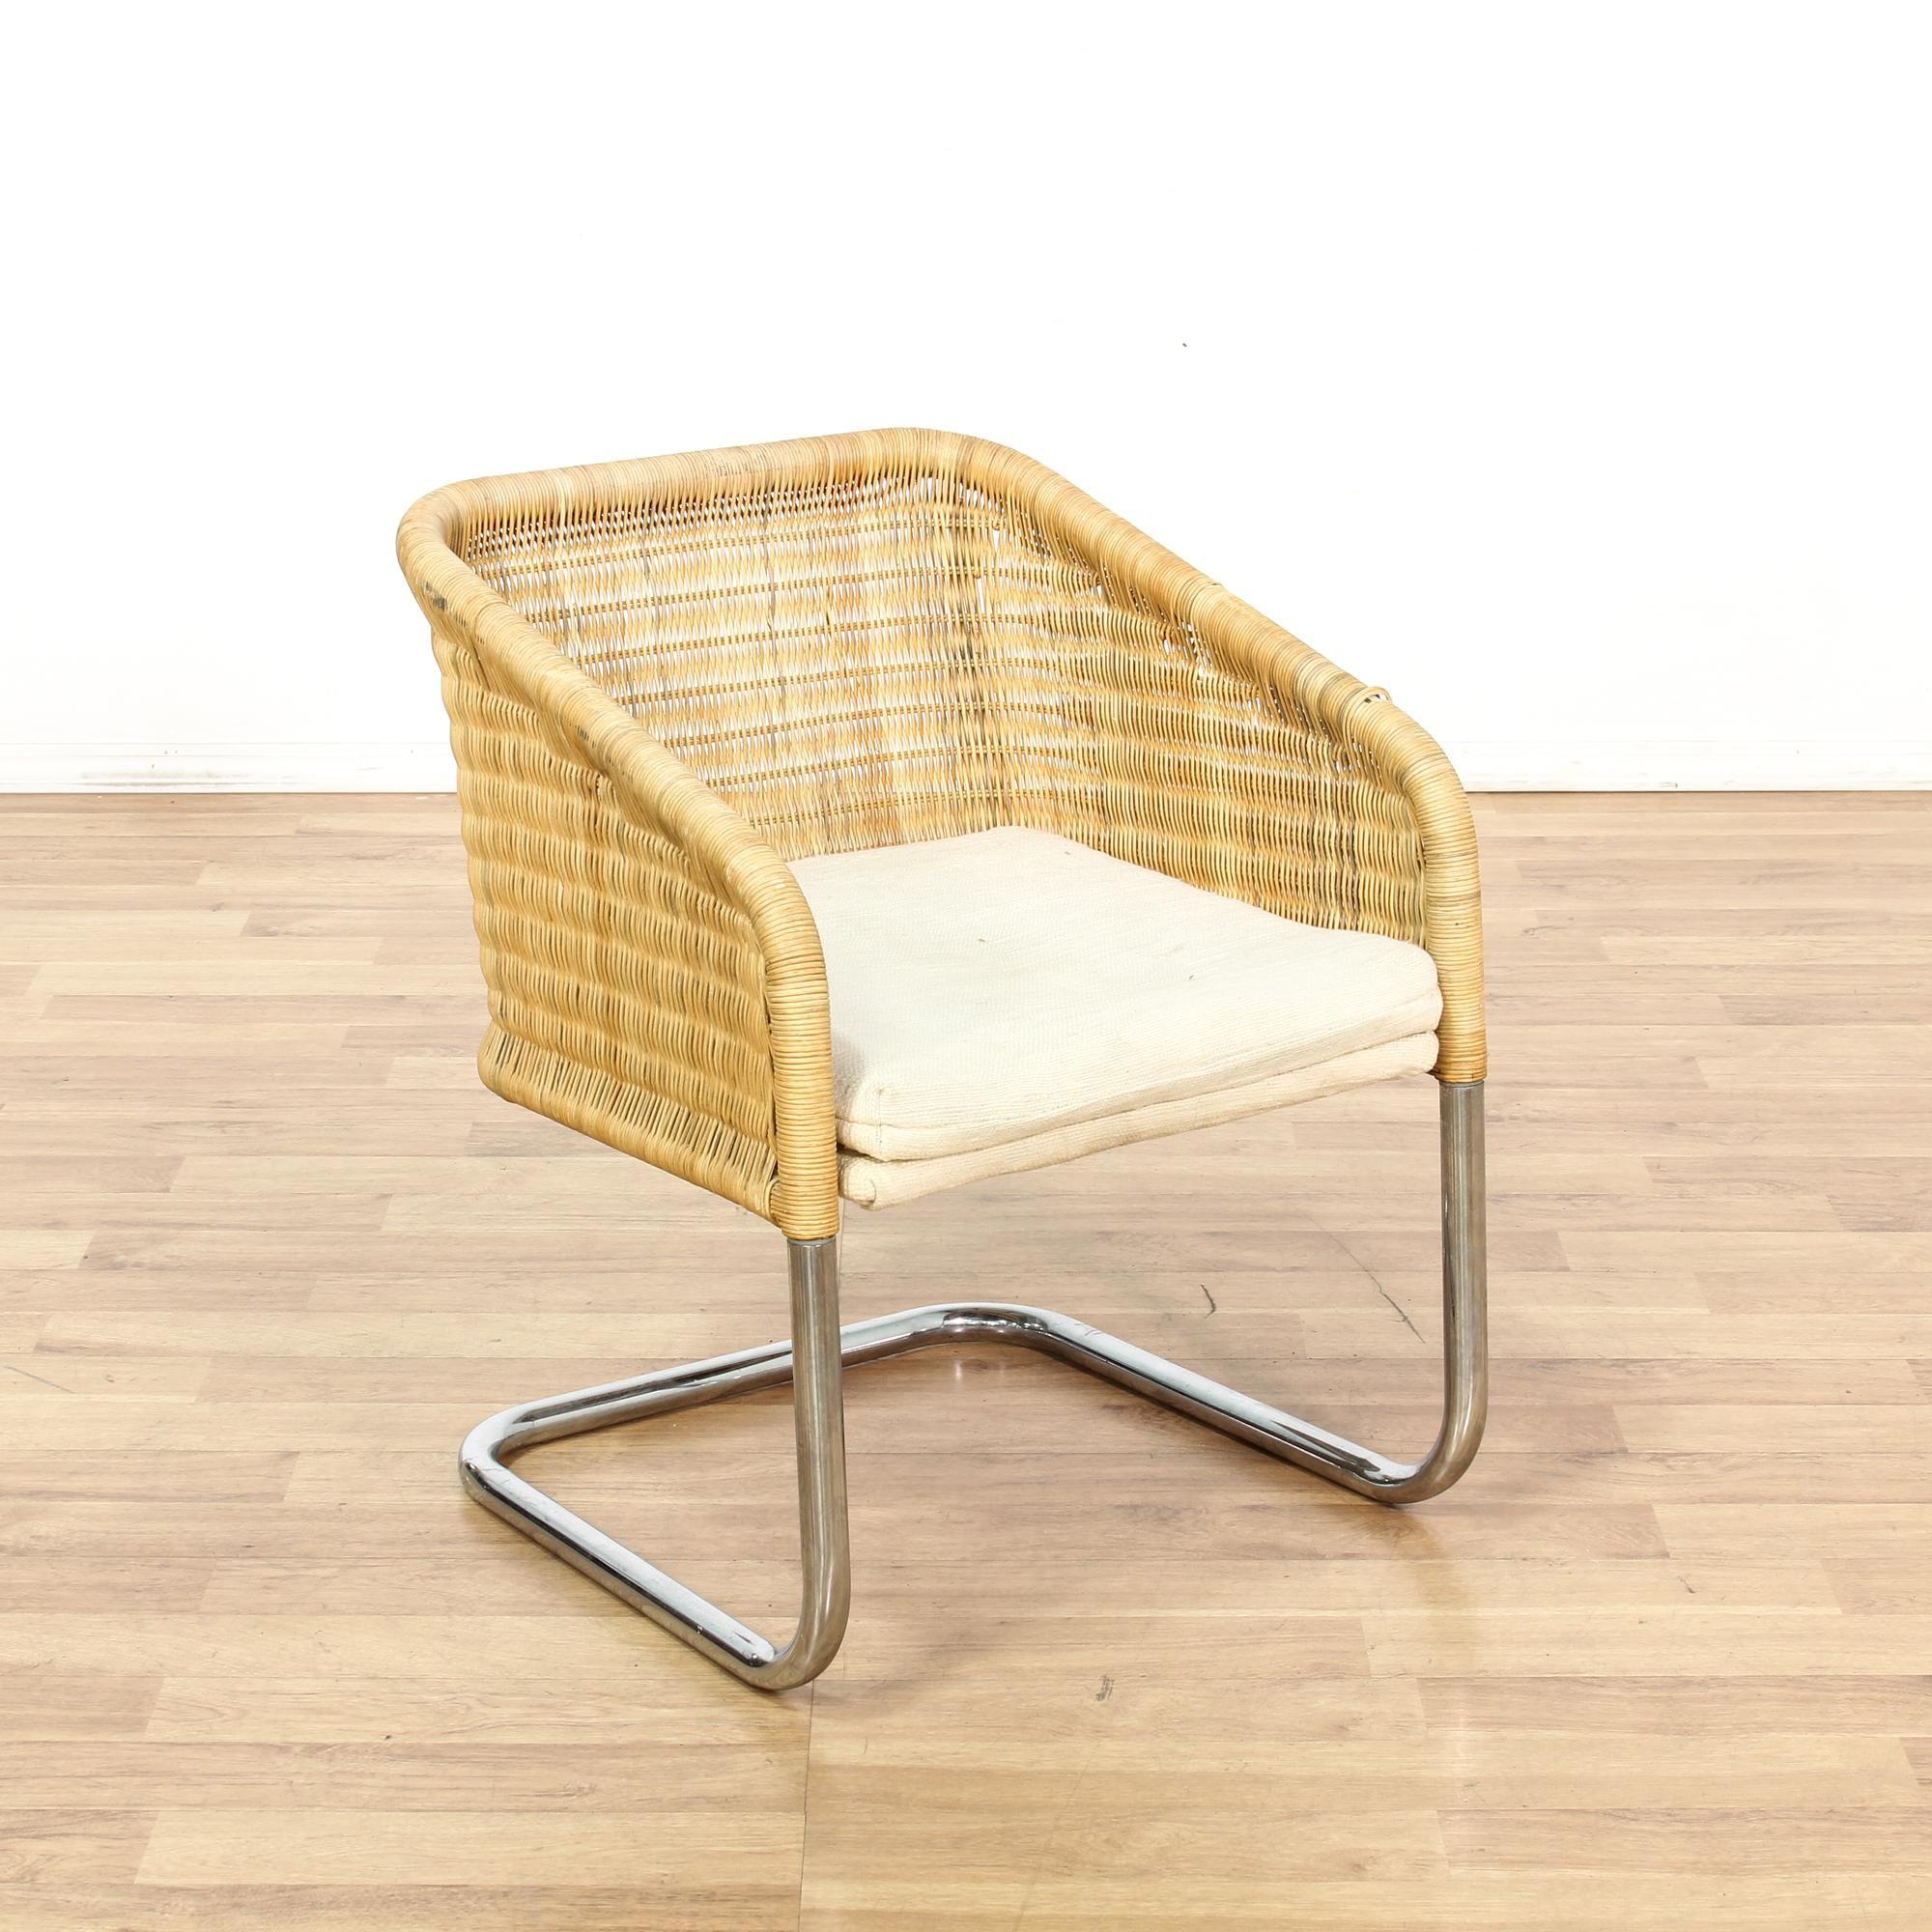 Mid Century Modern Wicker & Chrome Accent Chair